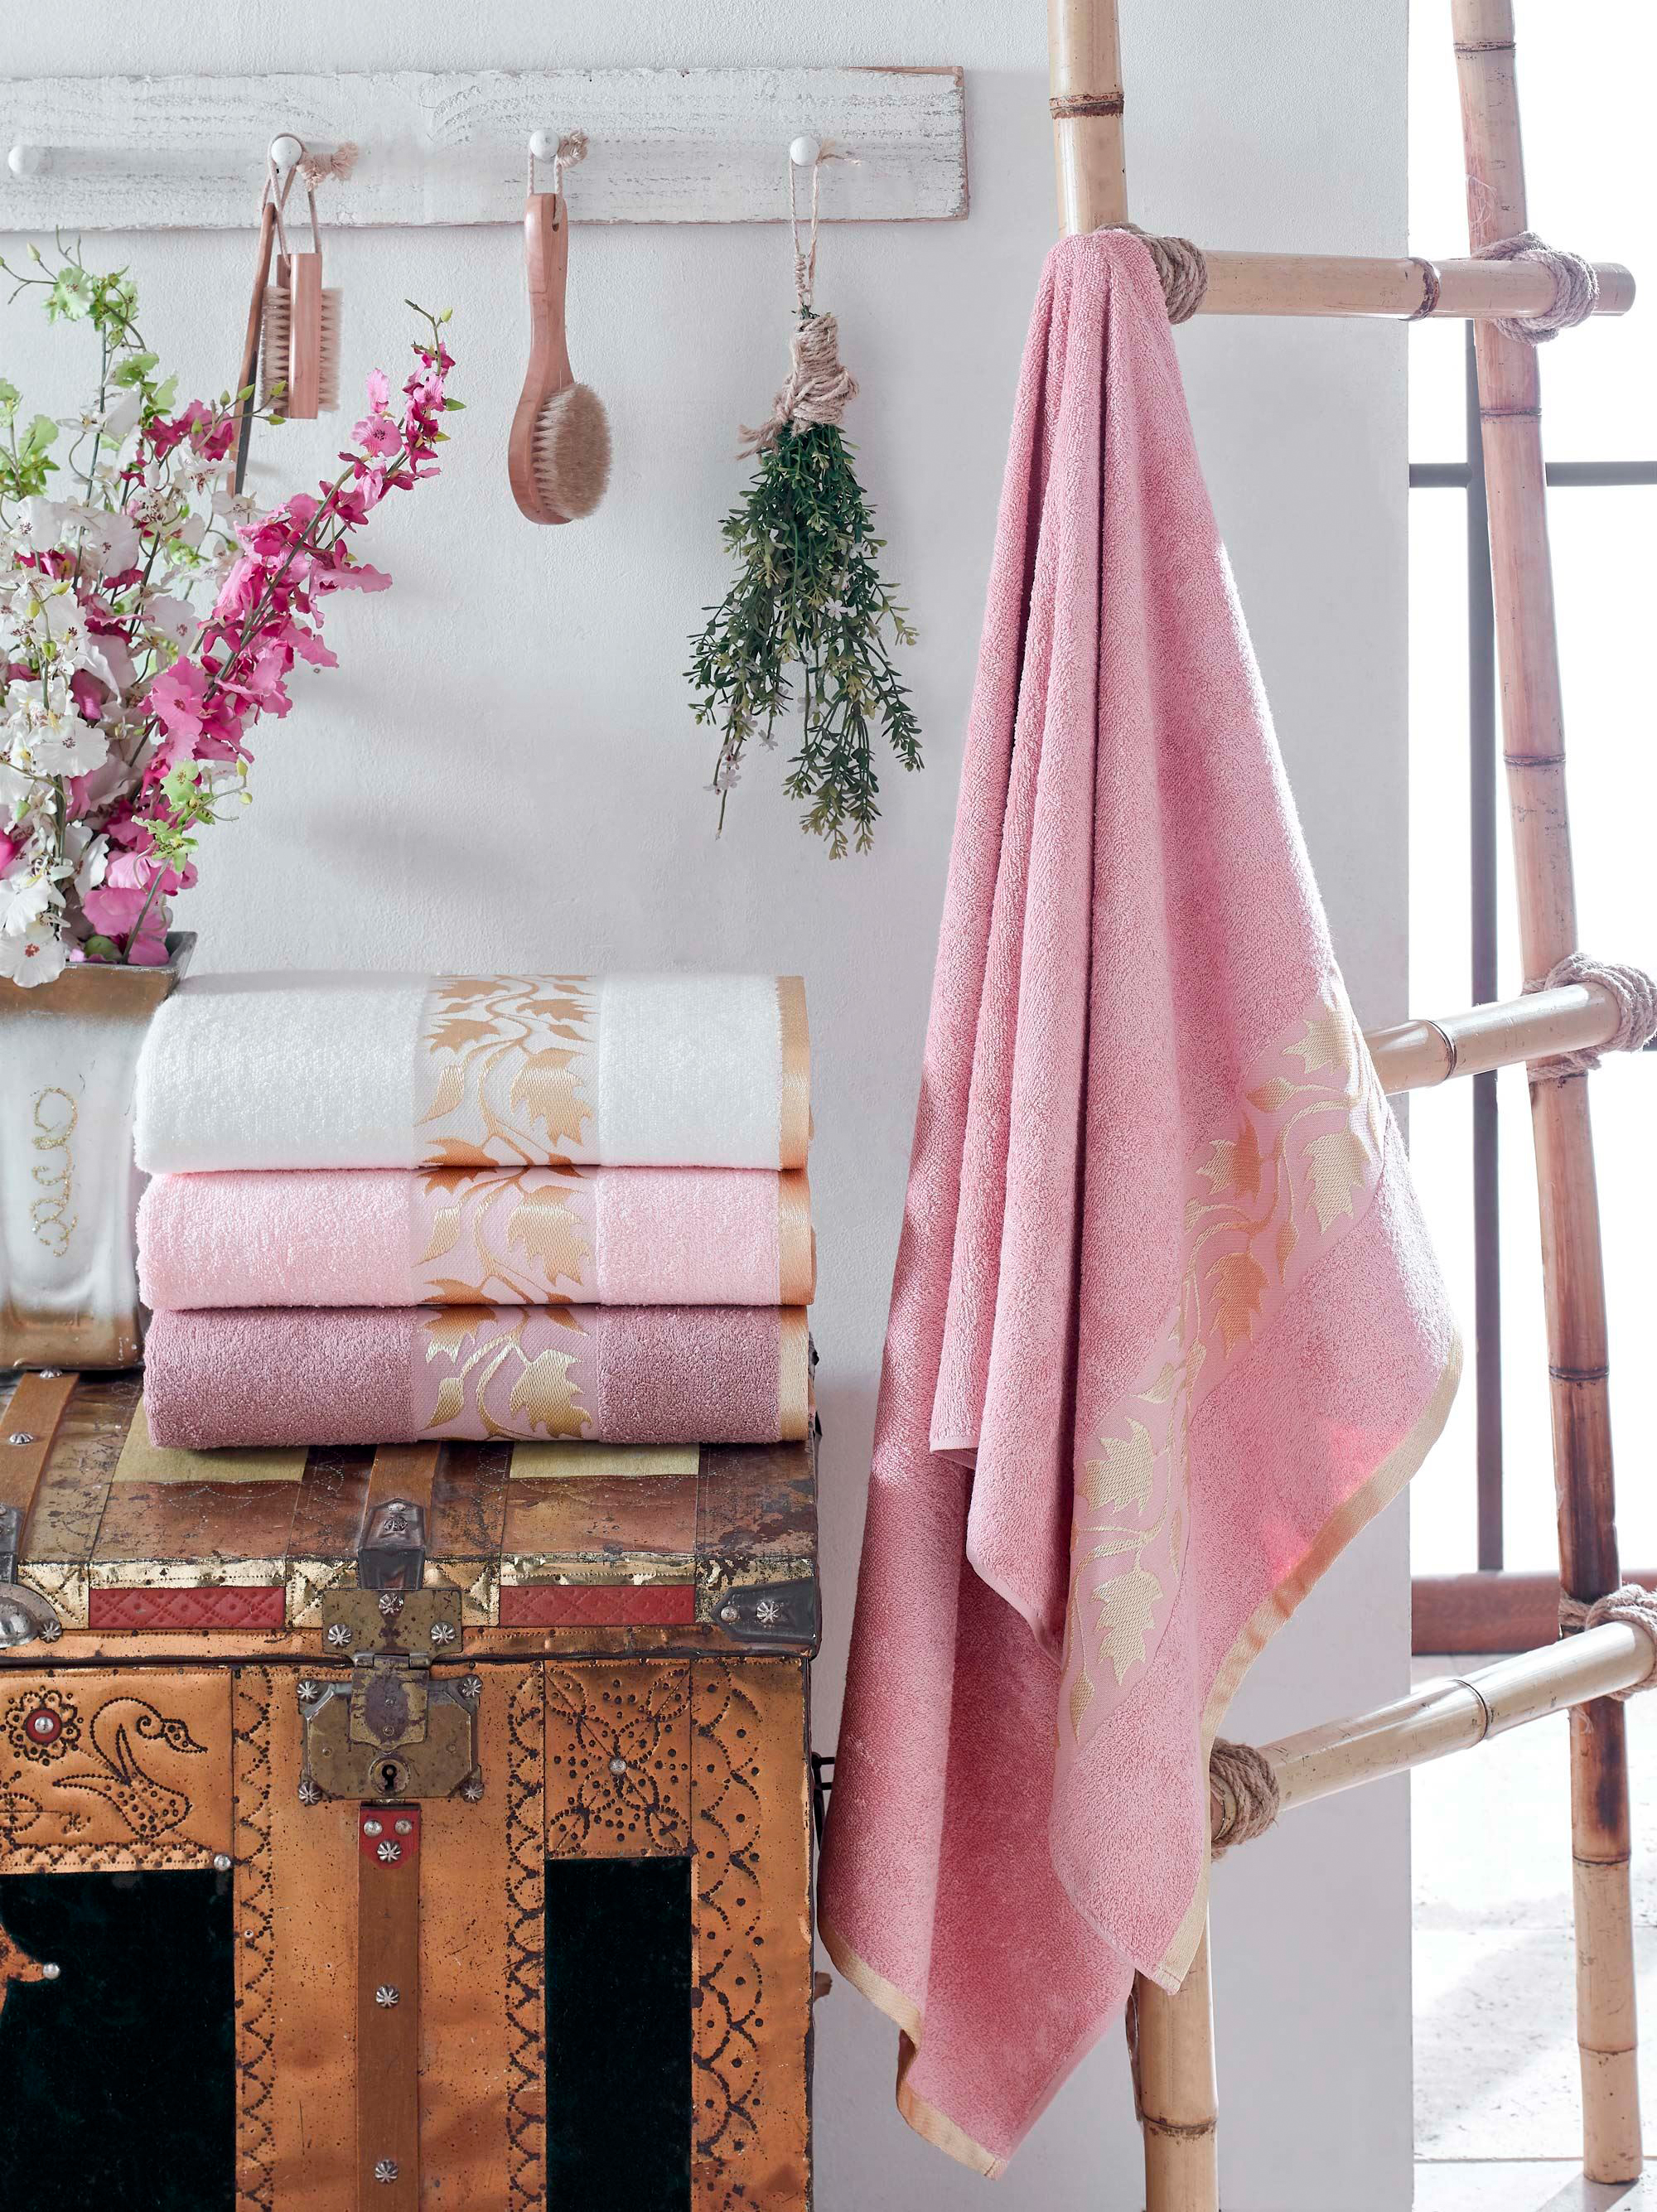 Купить Полотенца DO'n'CO, Полотенце Acacia (50х90 см - 4 шт), Турция, Розовый, Бамбук